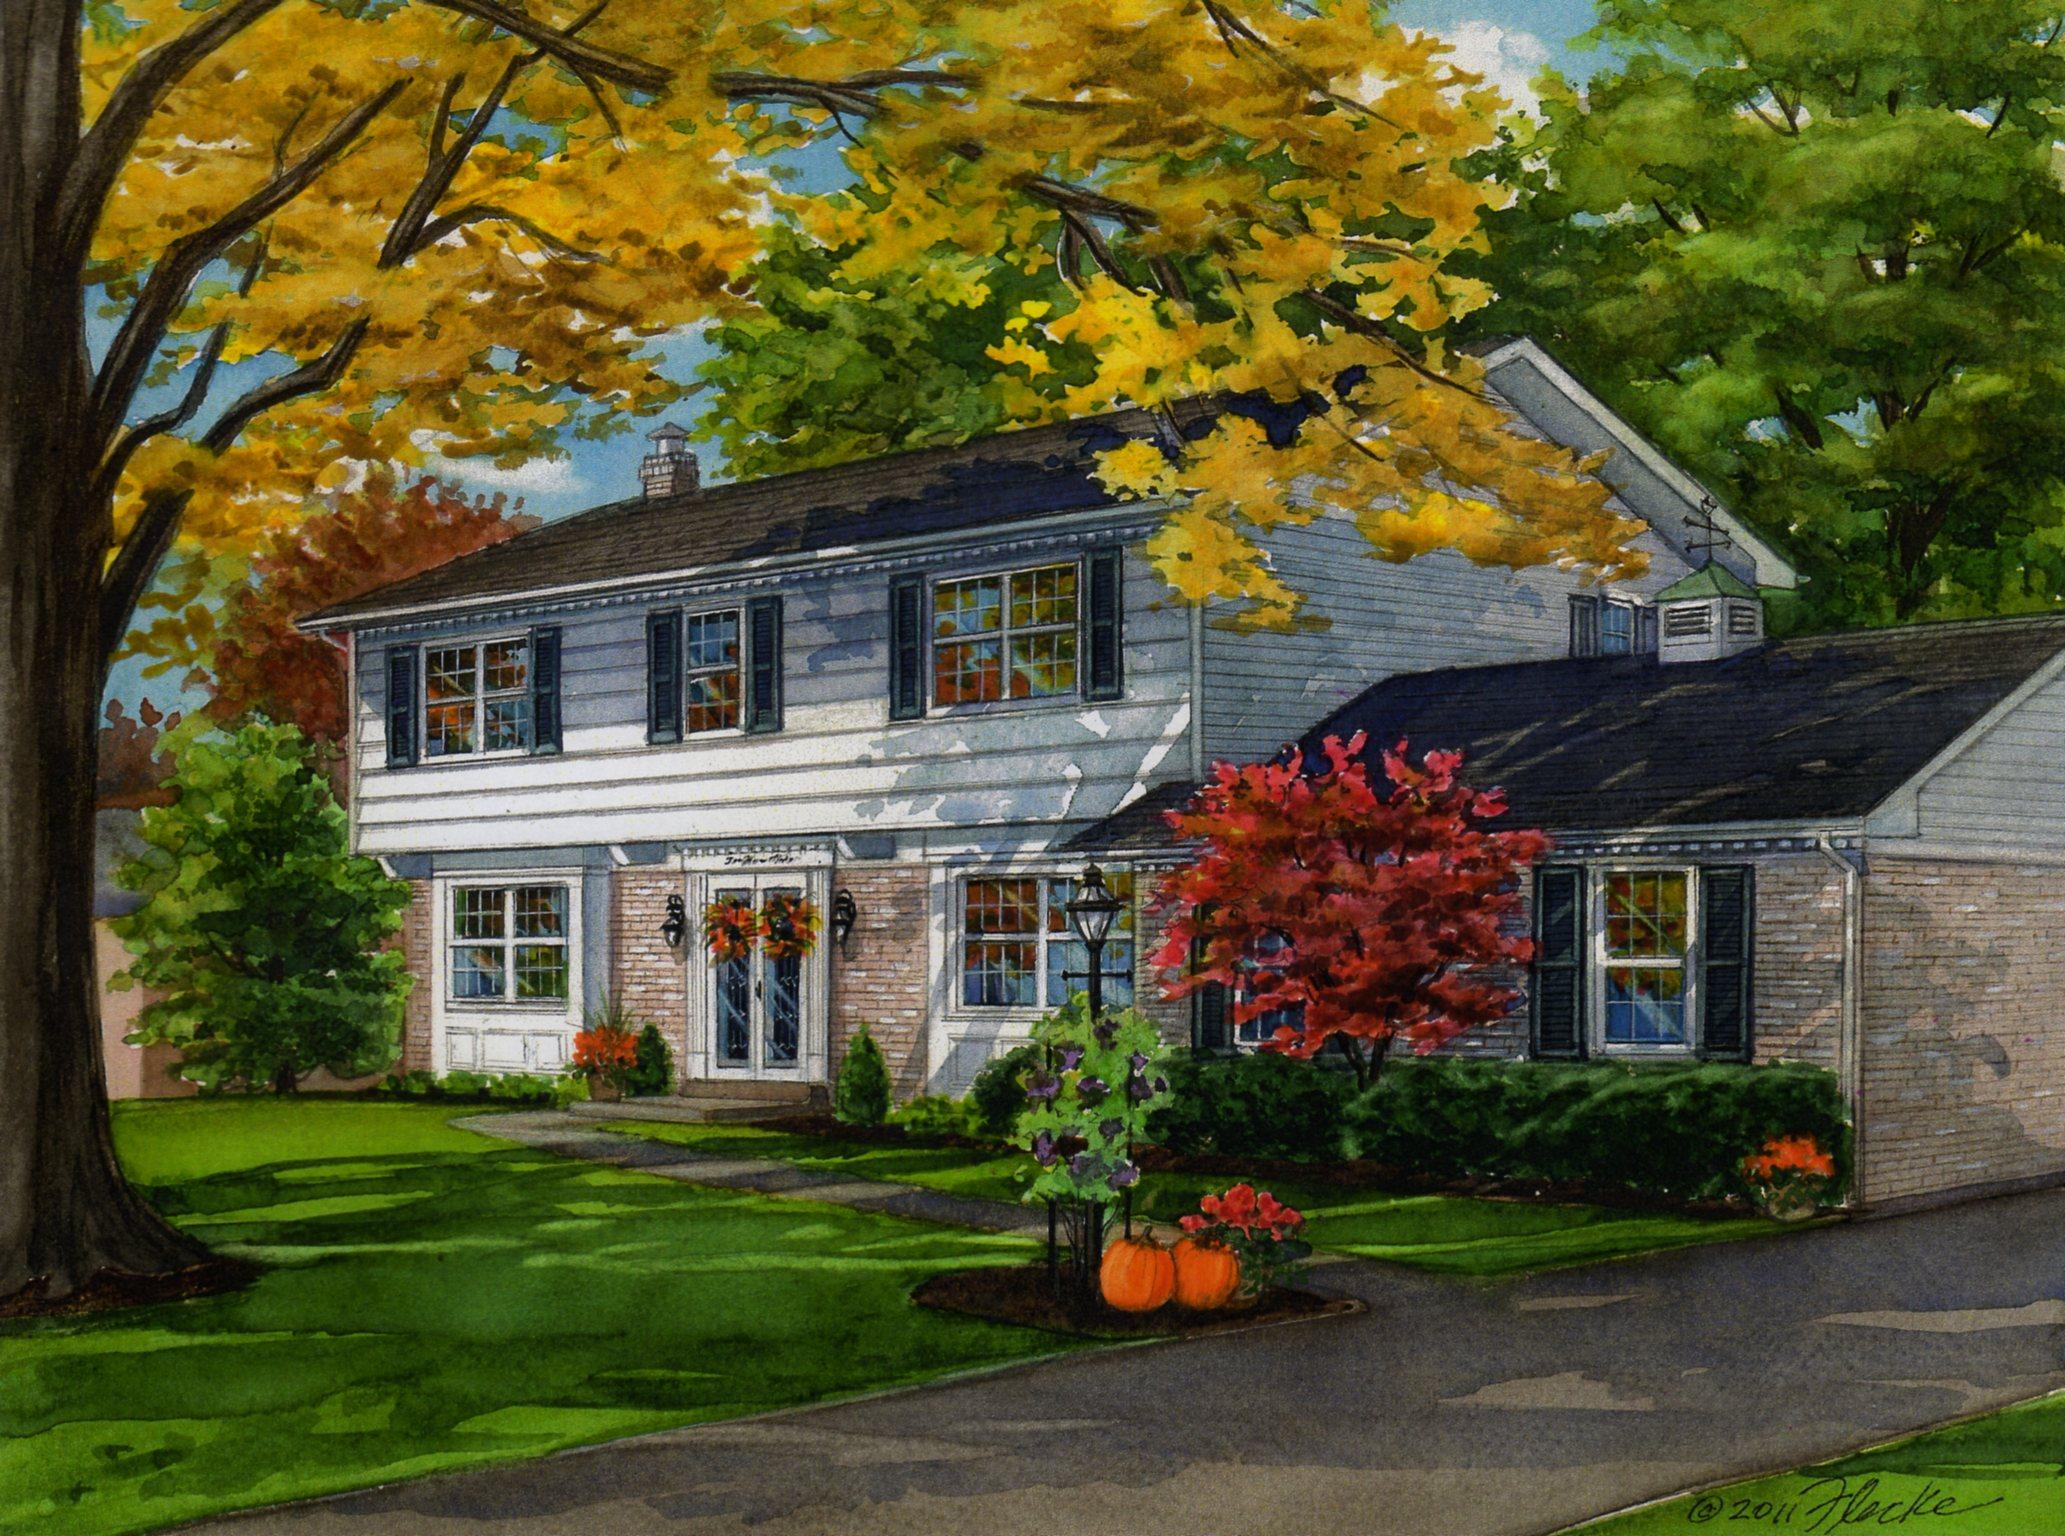 Charming Home in Fall Season   Custom House Portraits by ... - photo#1